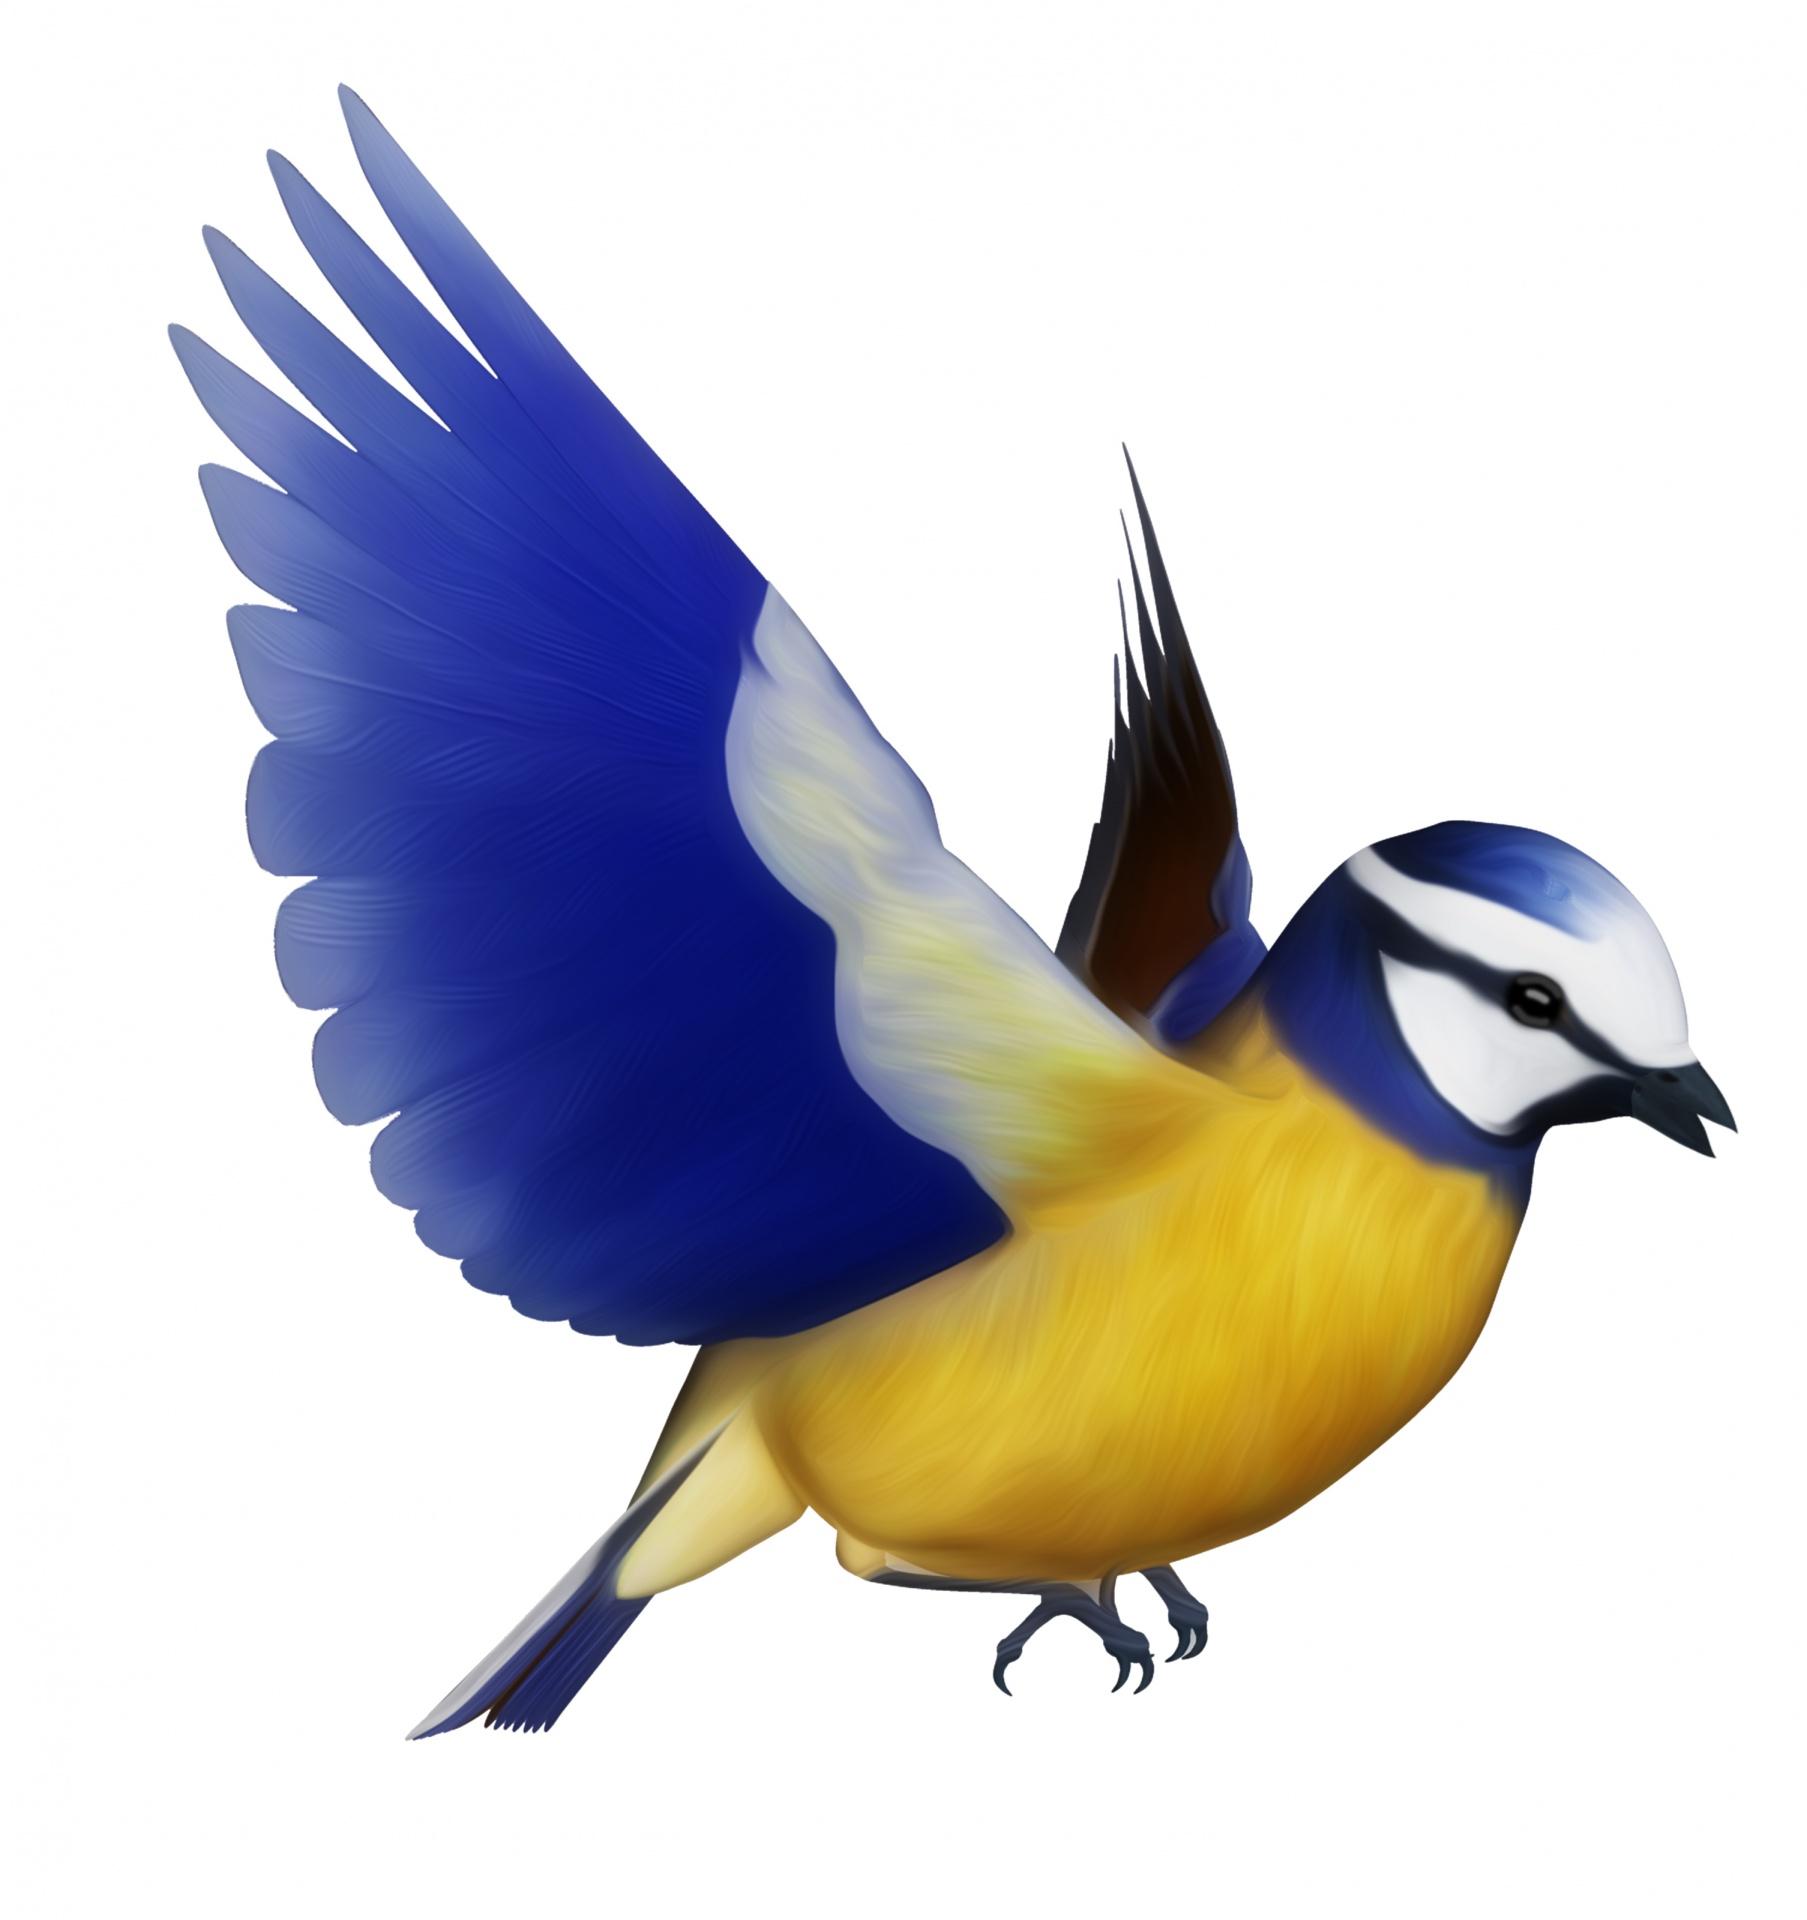 Blue tit bird clipart,bird,birds,clipart,commercial use